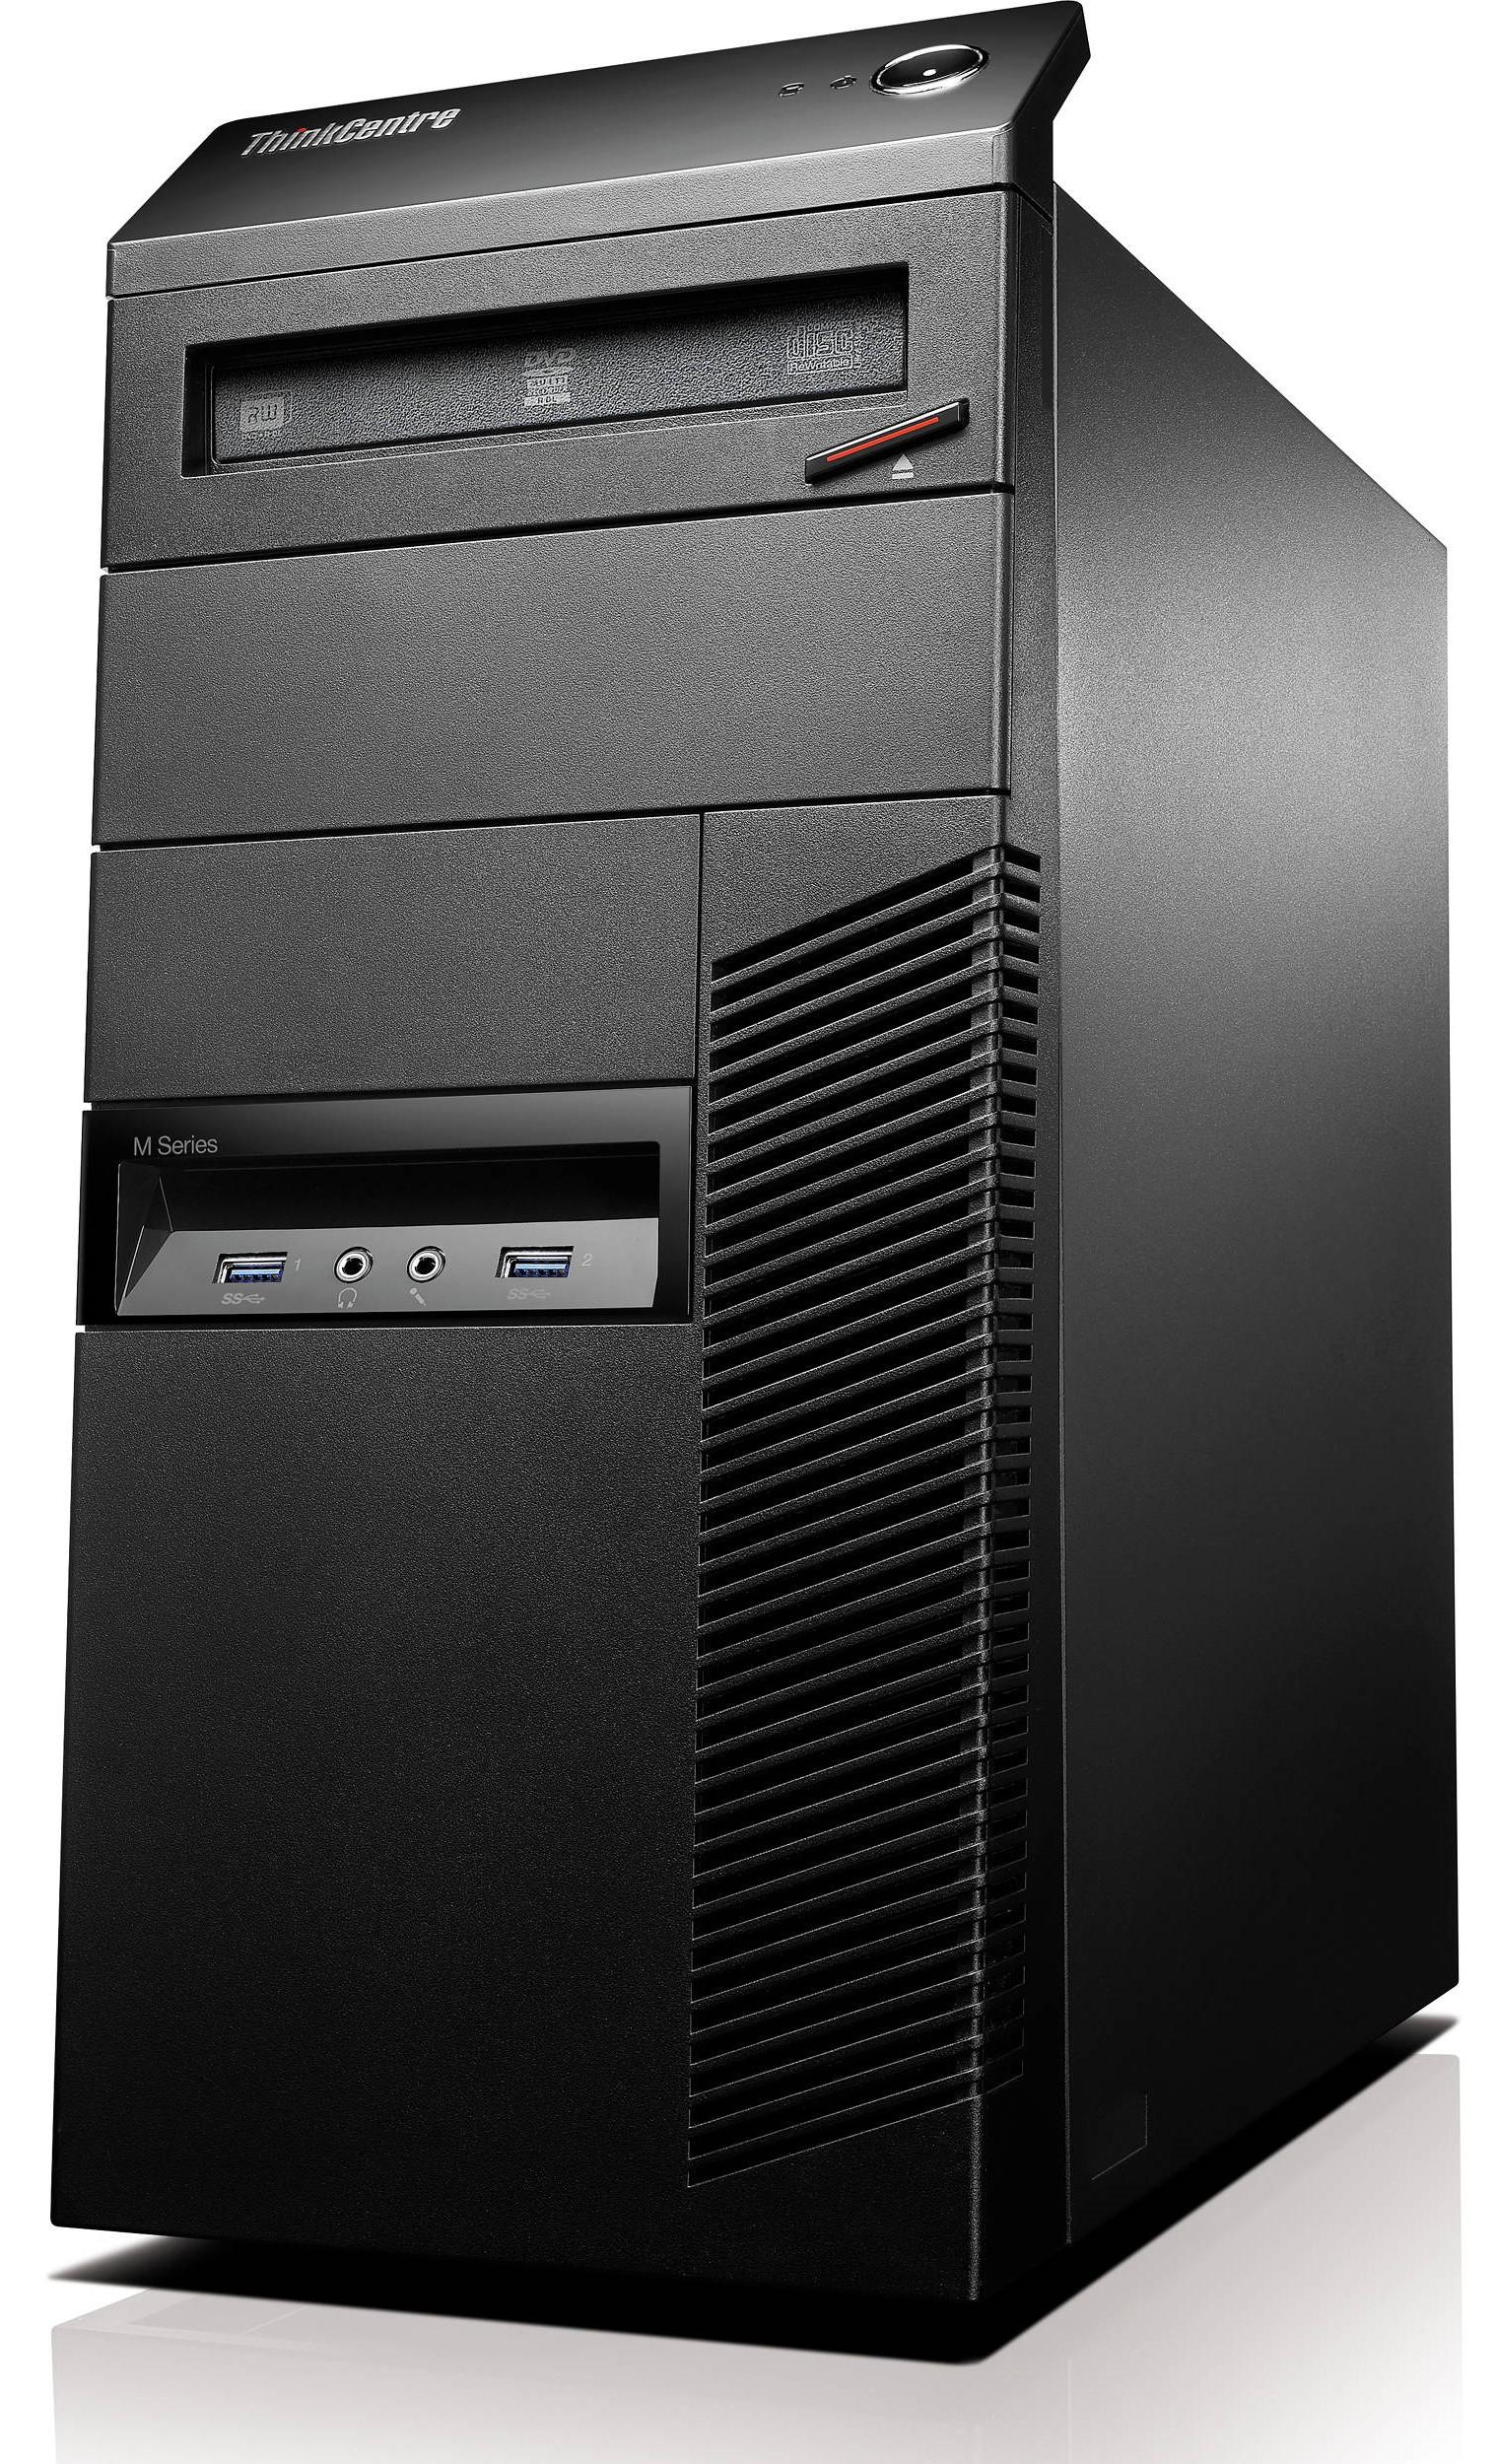 Lenovo ThinkCentre M73 MT